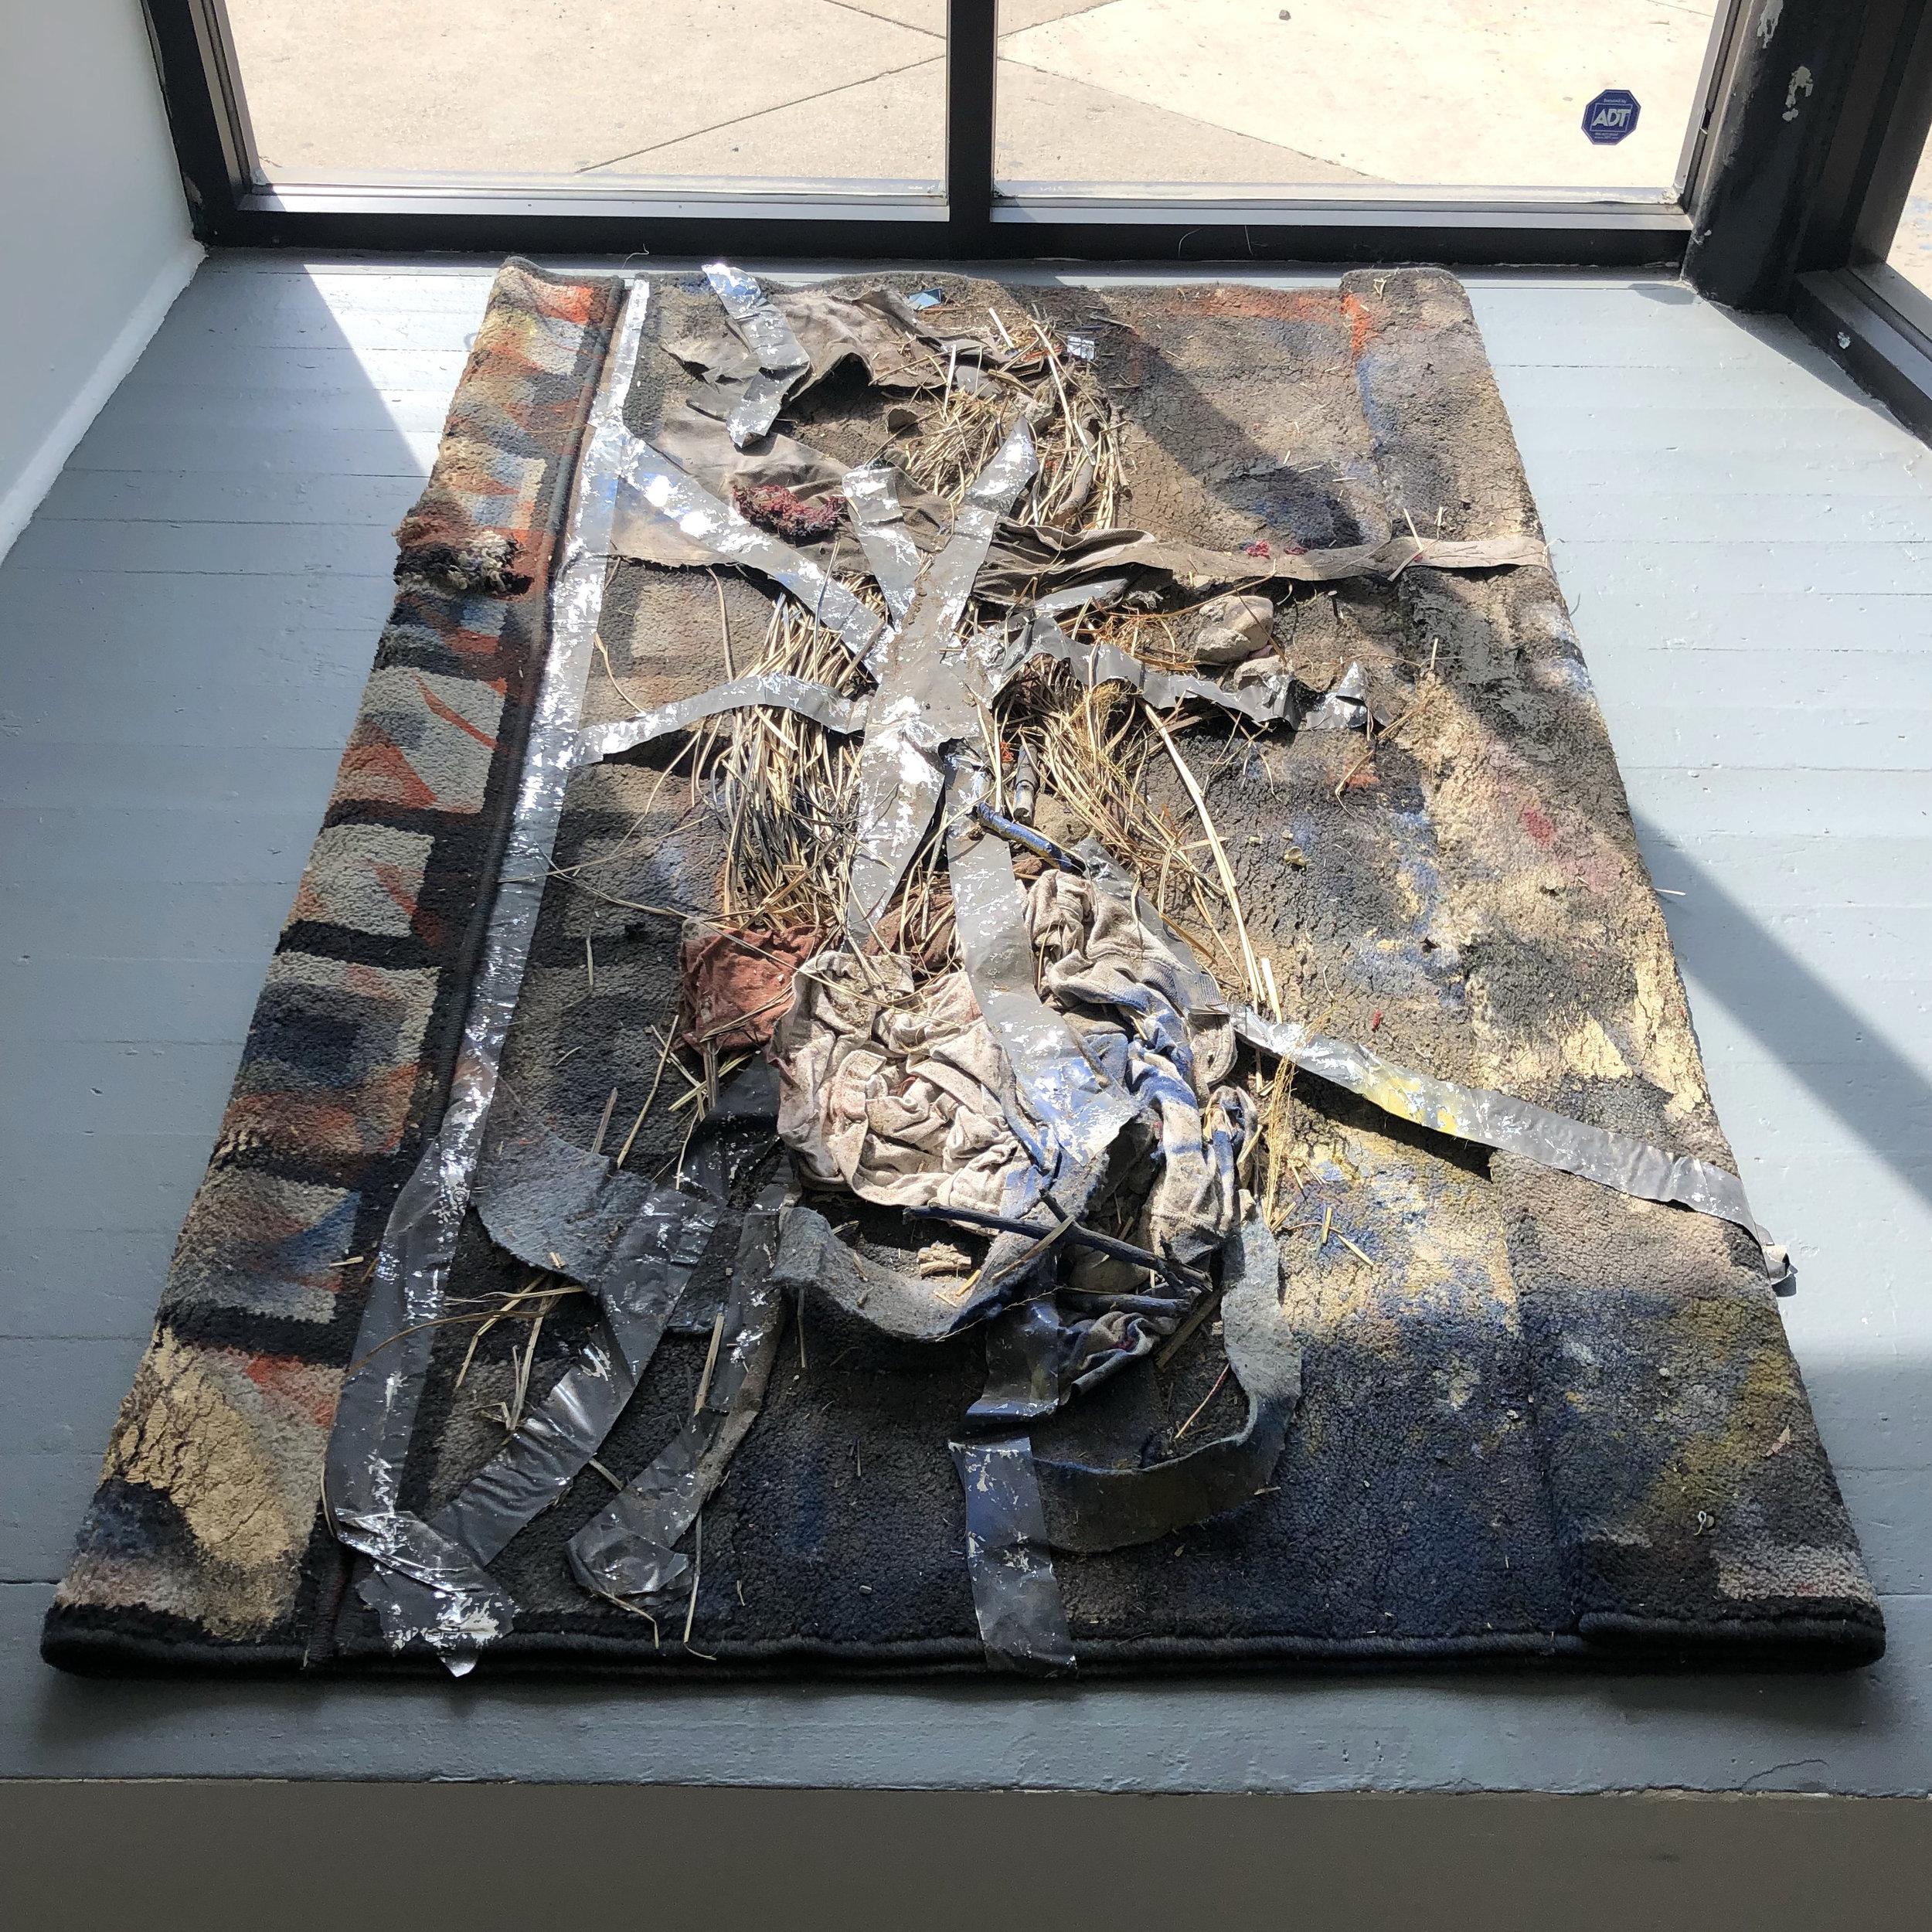 Tasseography , 2016 studio debris, tape, rug 39 x 62 x 1 in